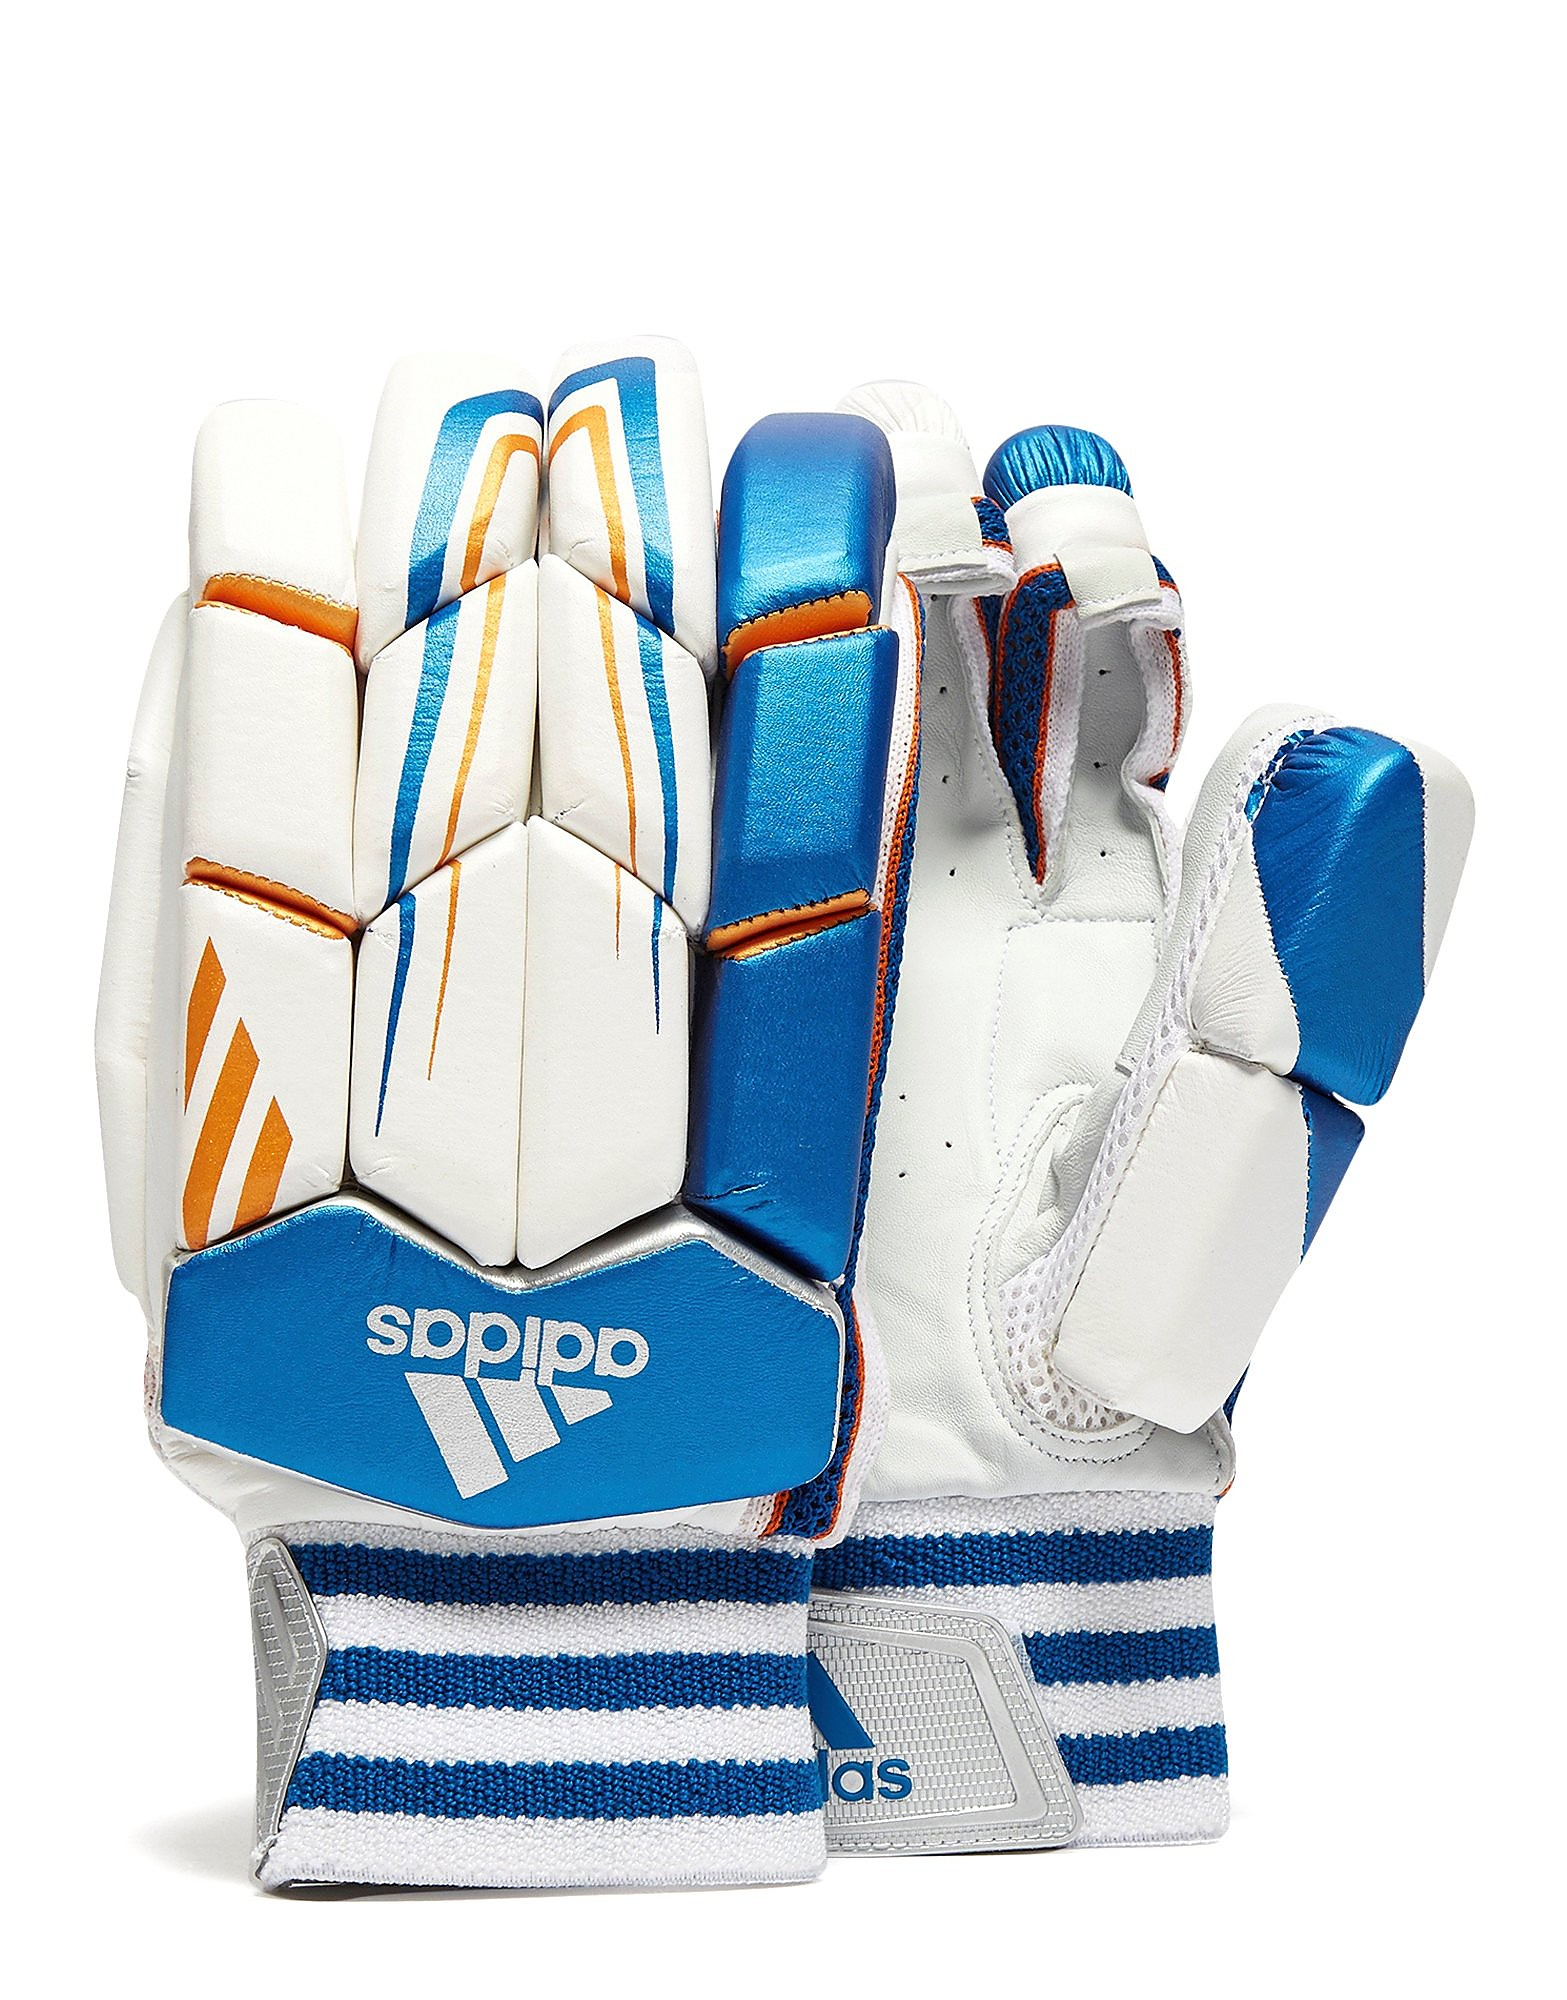 adidas CX11 Cricket Batting Gloves